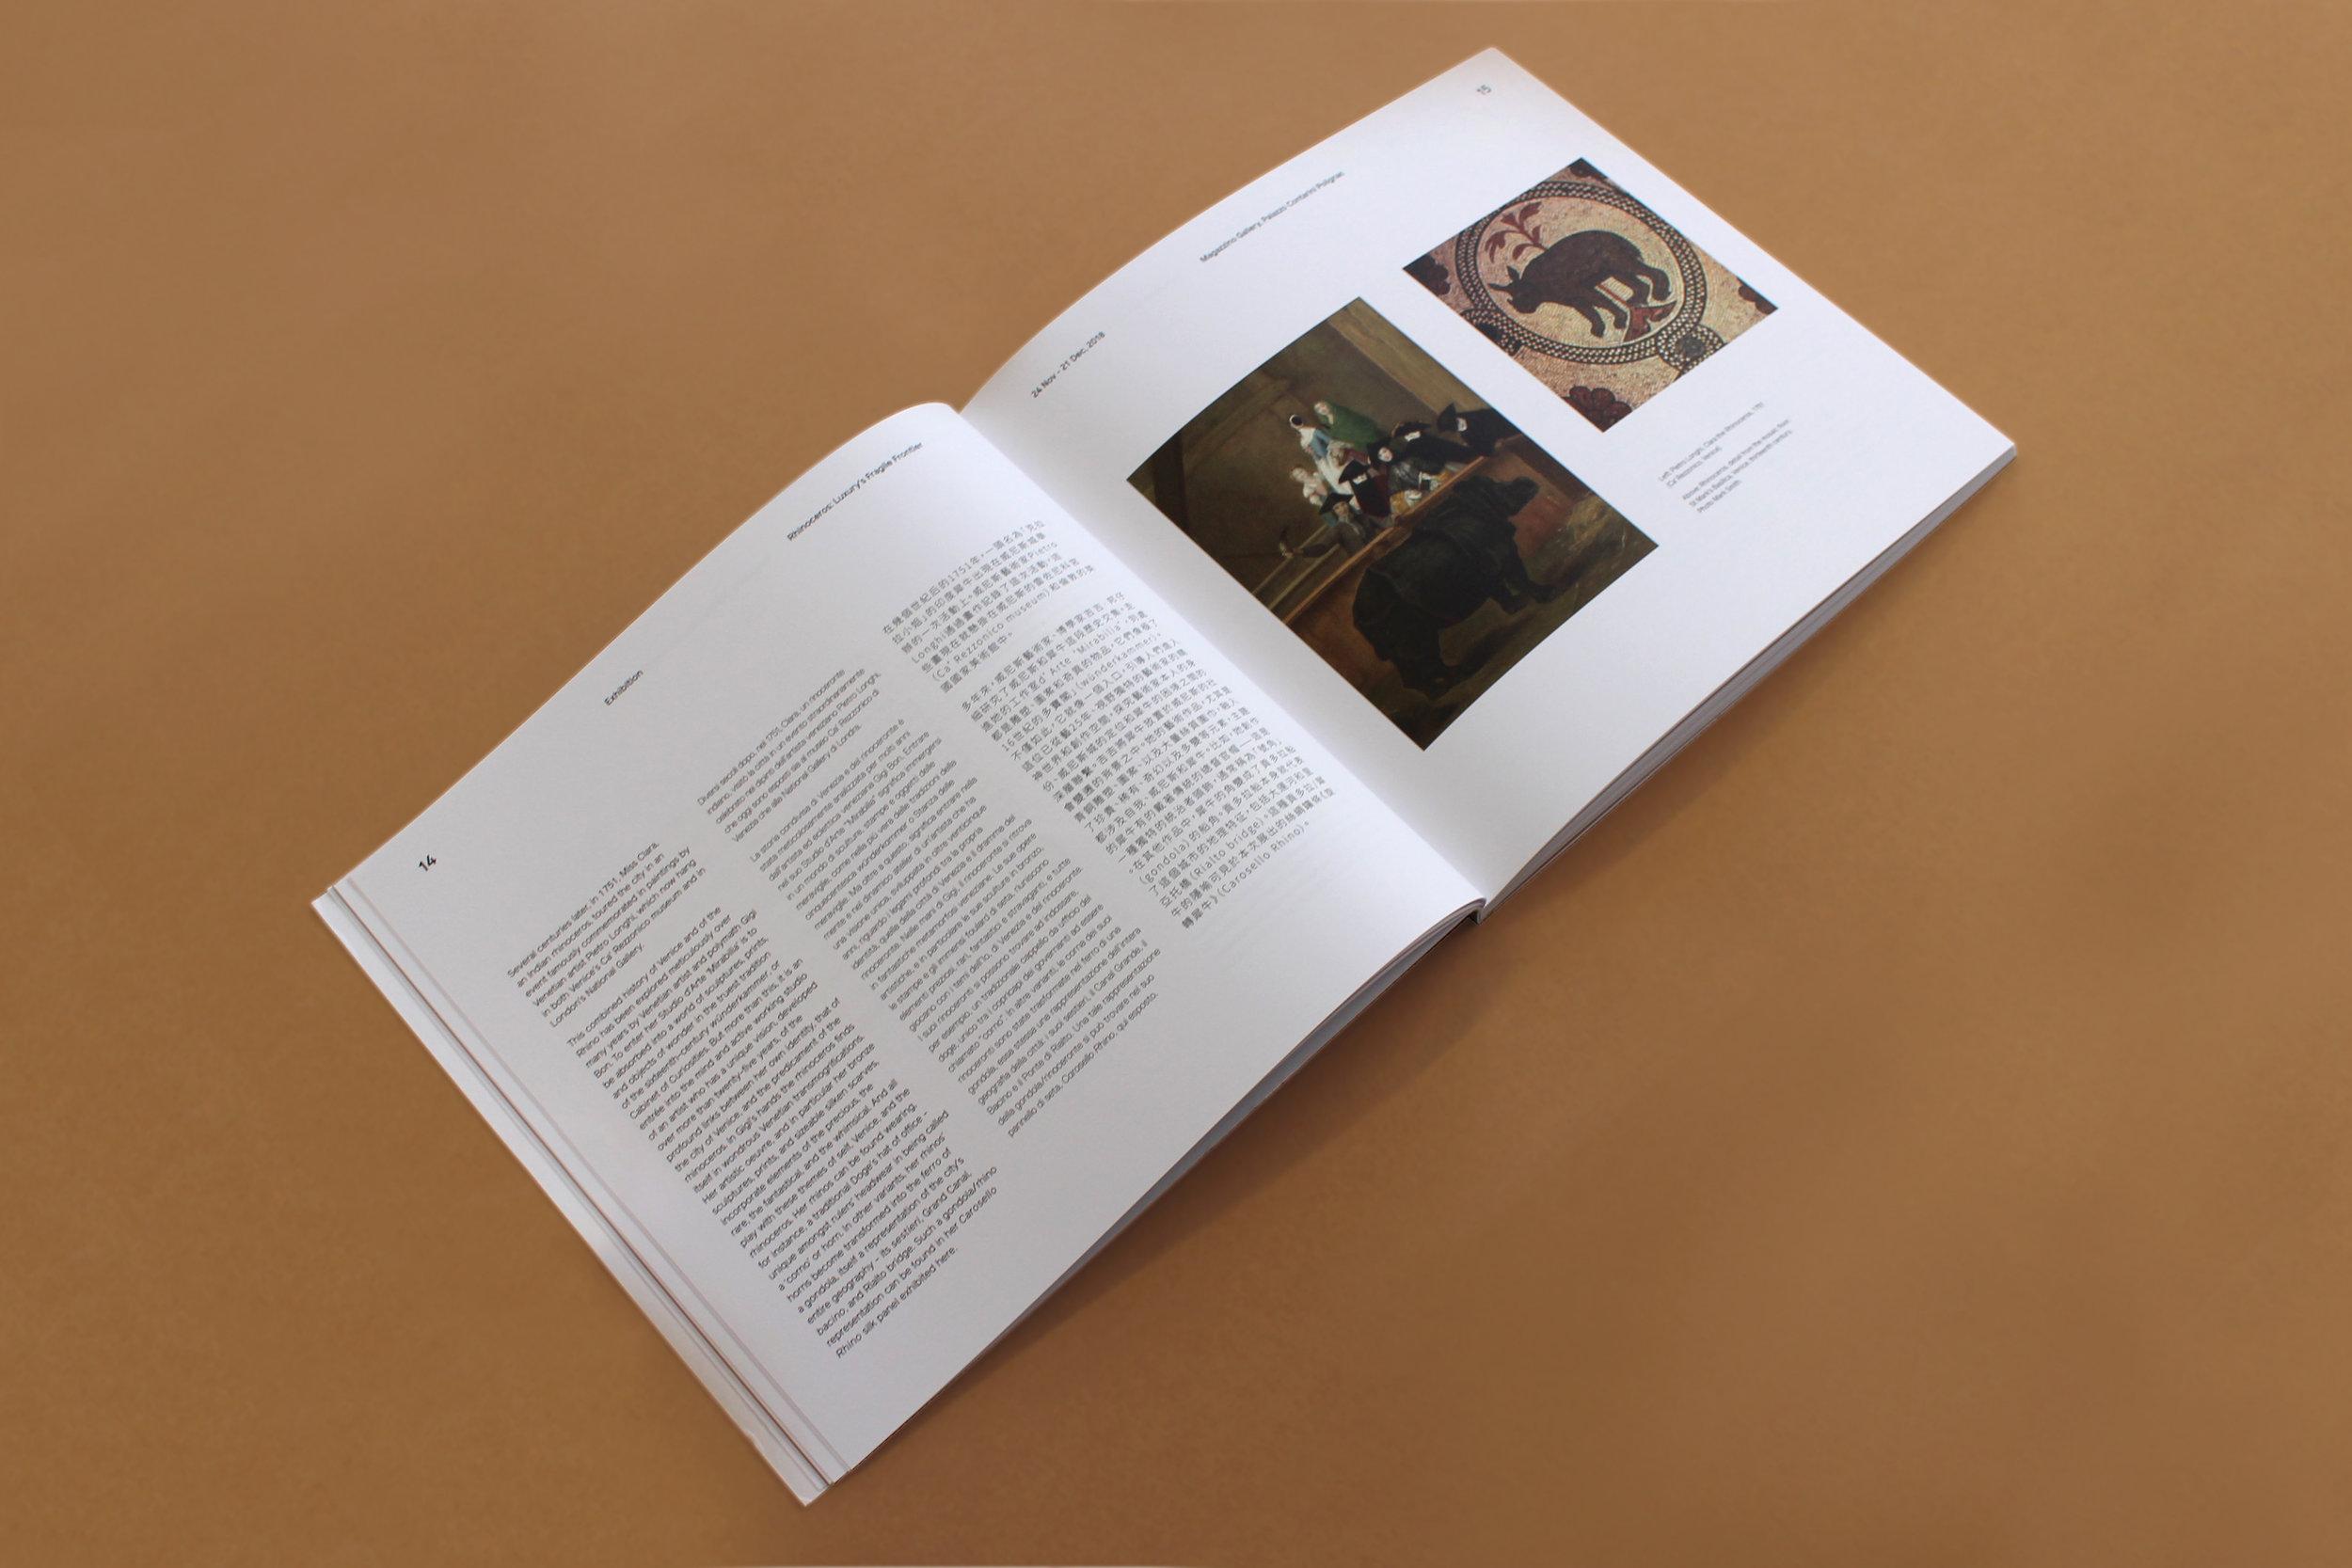 Rhinoceros - Luxury's Fragile Frontier Exhibition catelouge